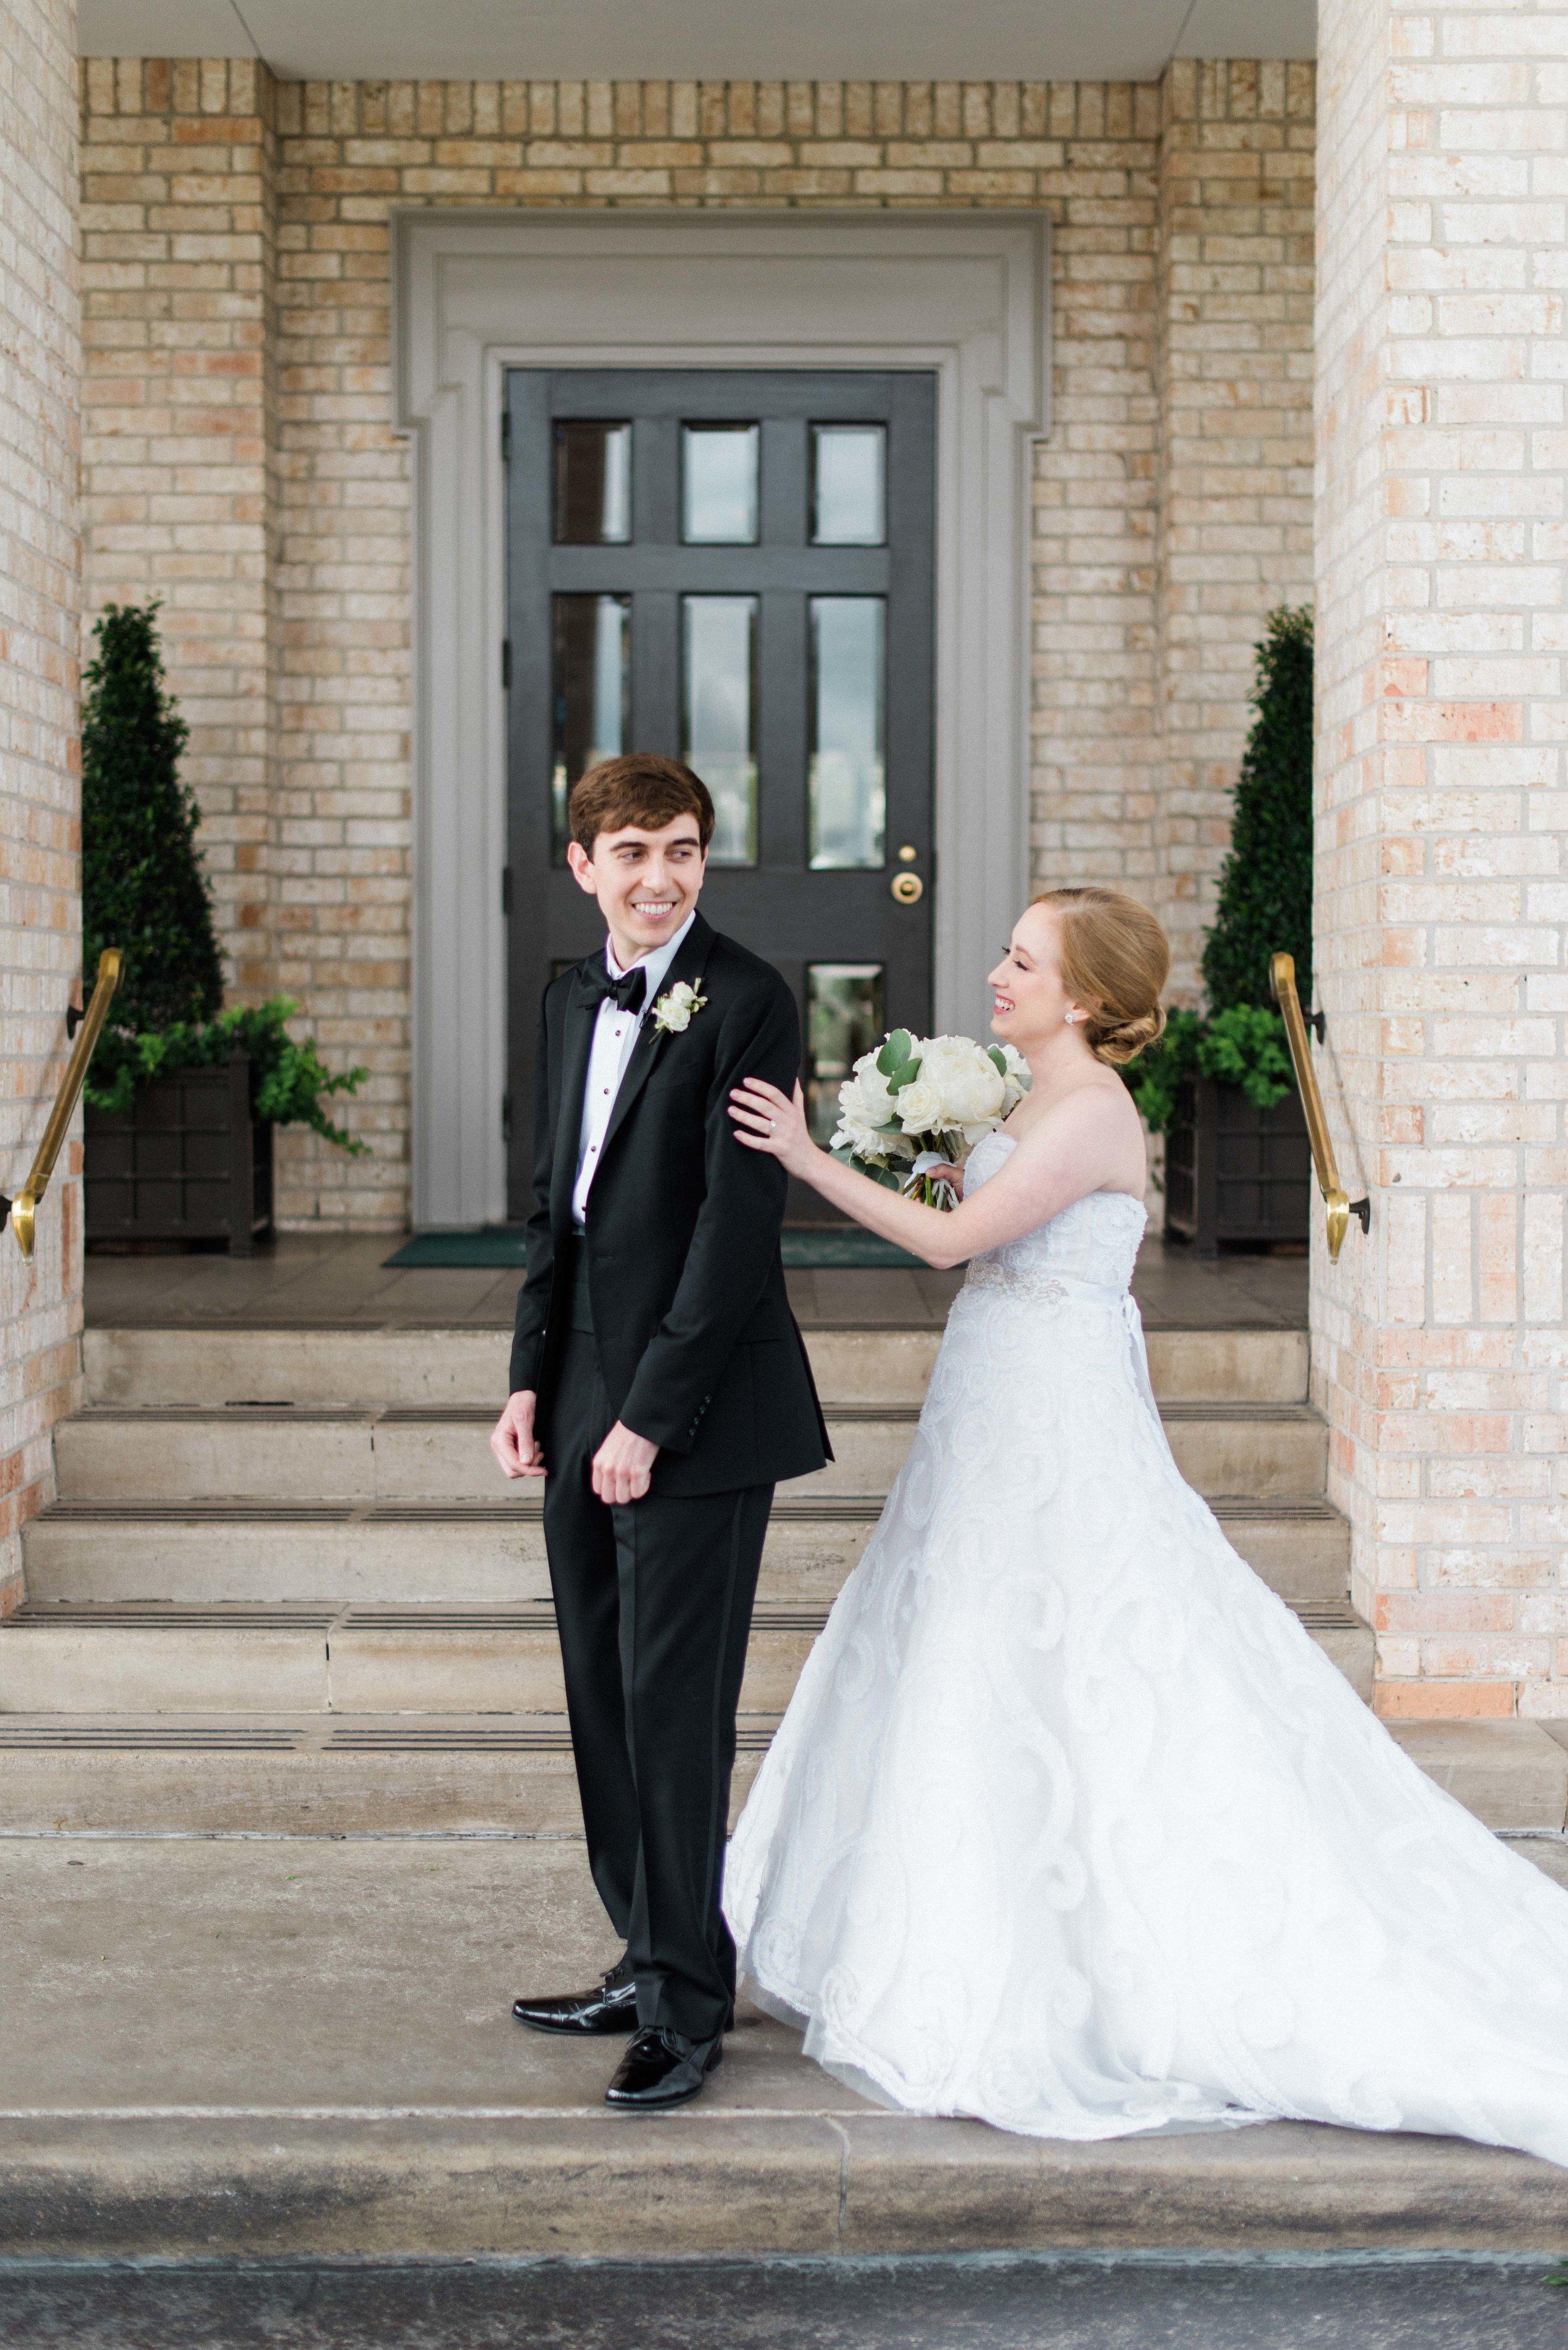 Fine-Art-Film-Houston-Wedding-Photographer-Best-Top-Luxury-Texas-Austin-Dallas-Destination-Dana-Fernandez-Photography-River-Oaks-Country-Club-South-Main-Baptist-Ceremony-Reception-Wedding-21.jpg